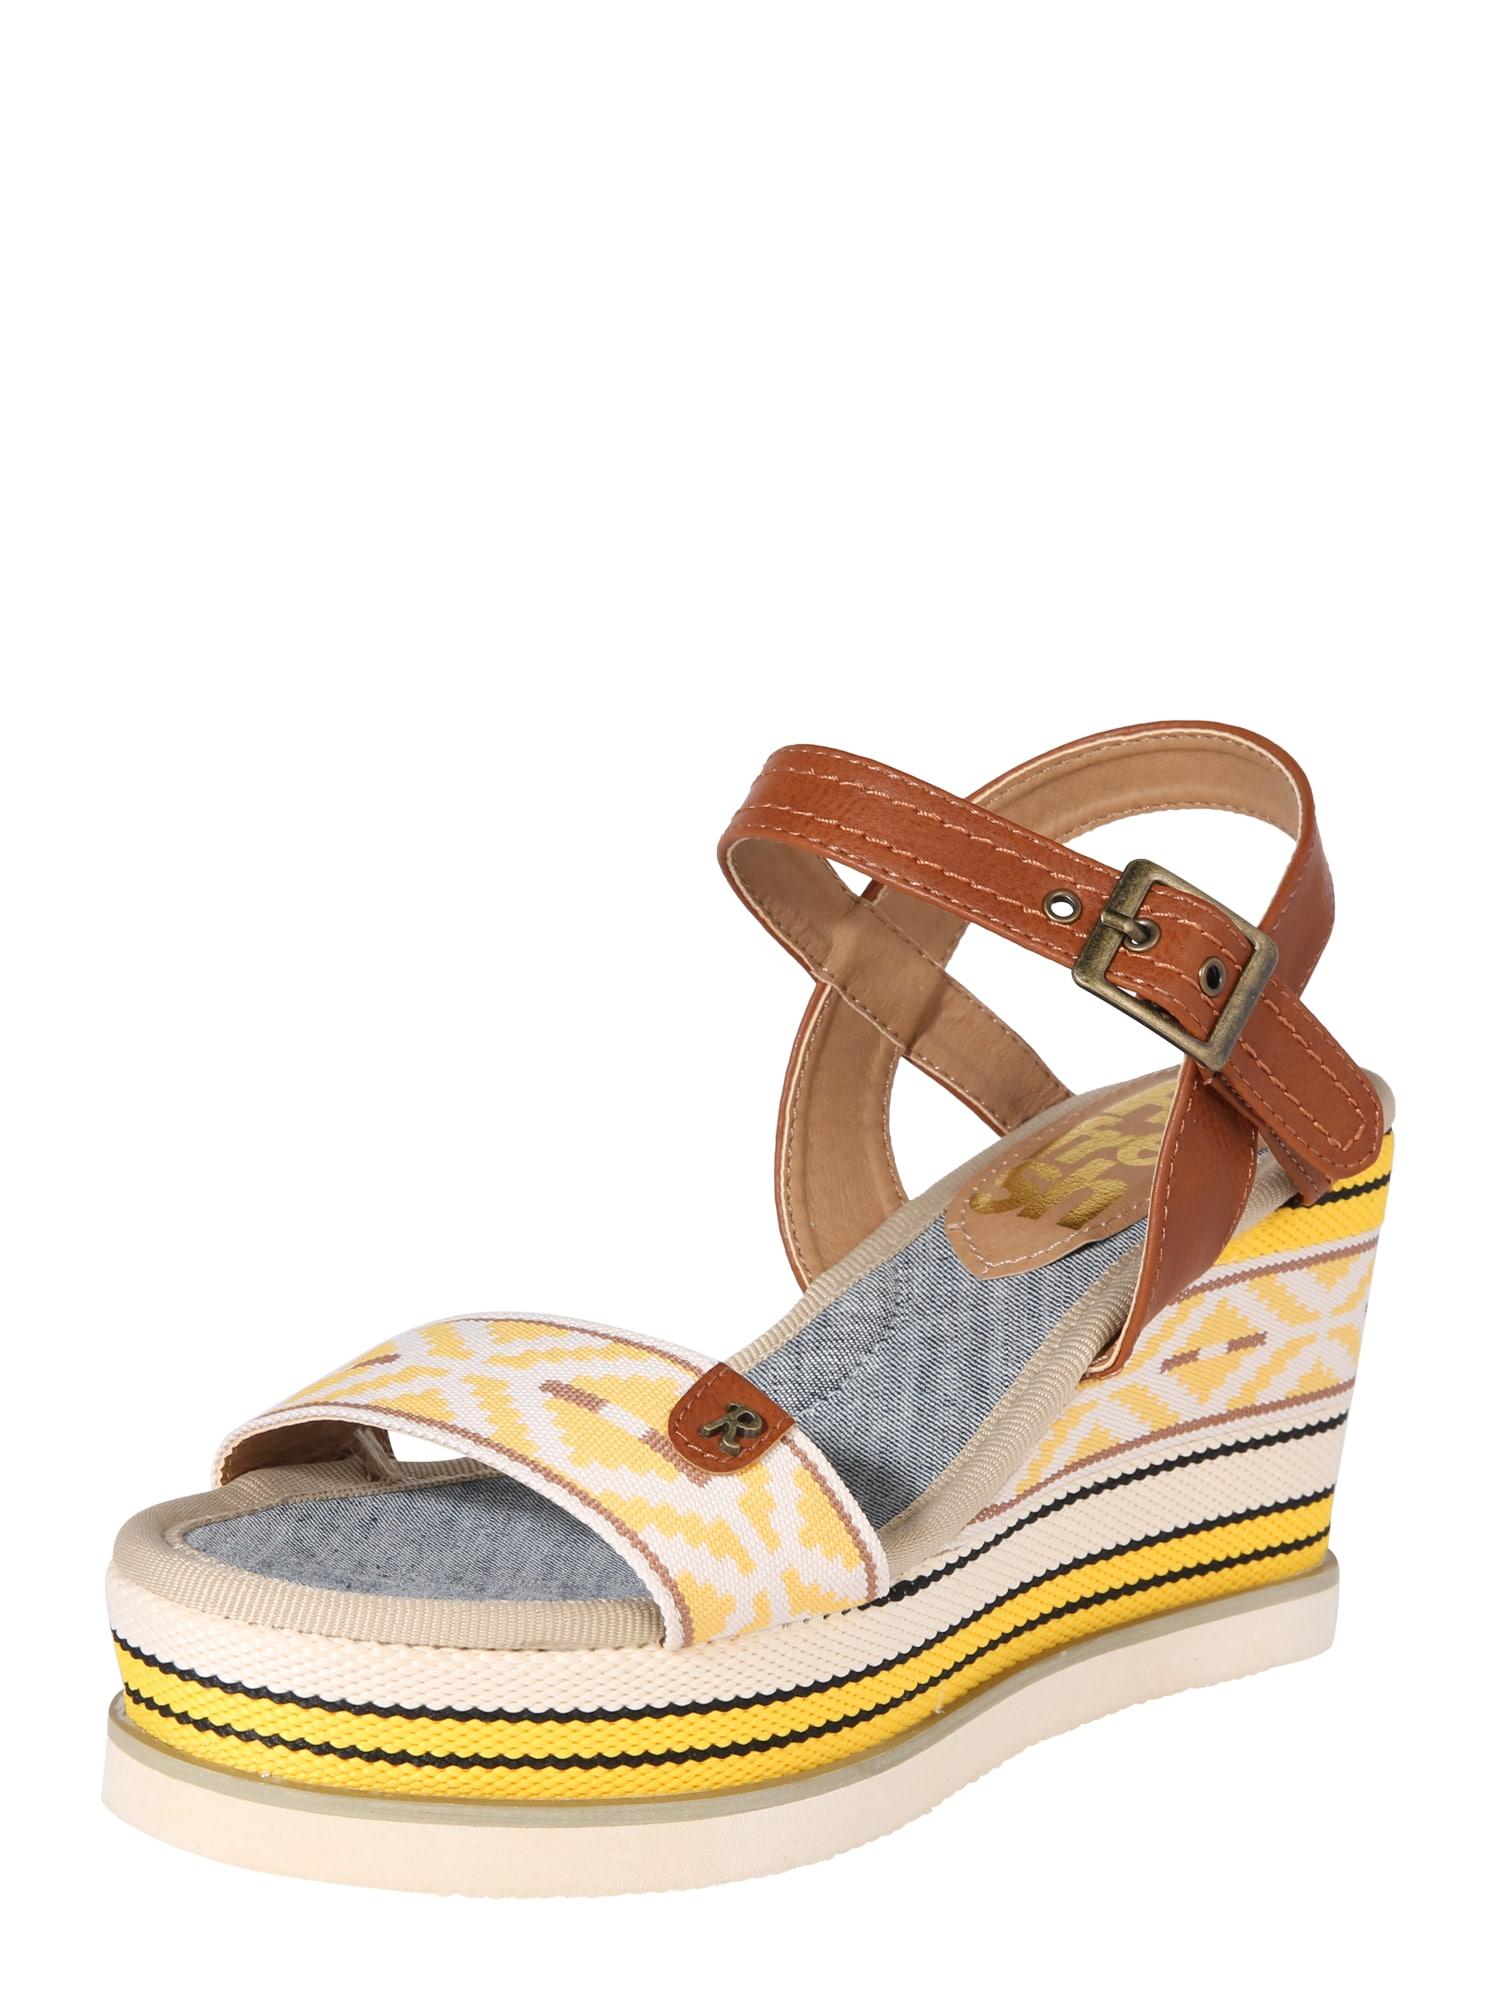 Sandály CANVAS béžová hnědá žlutá Refresh